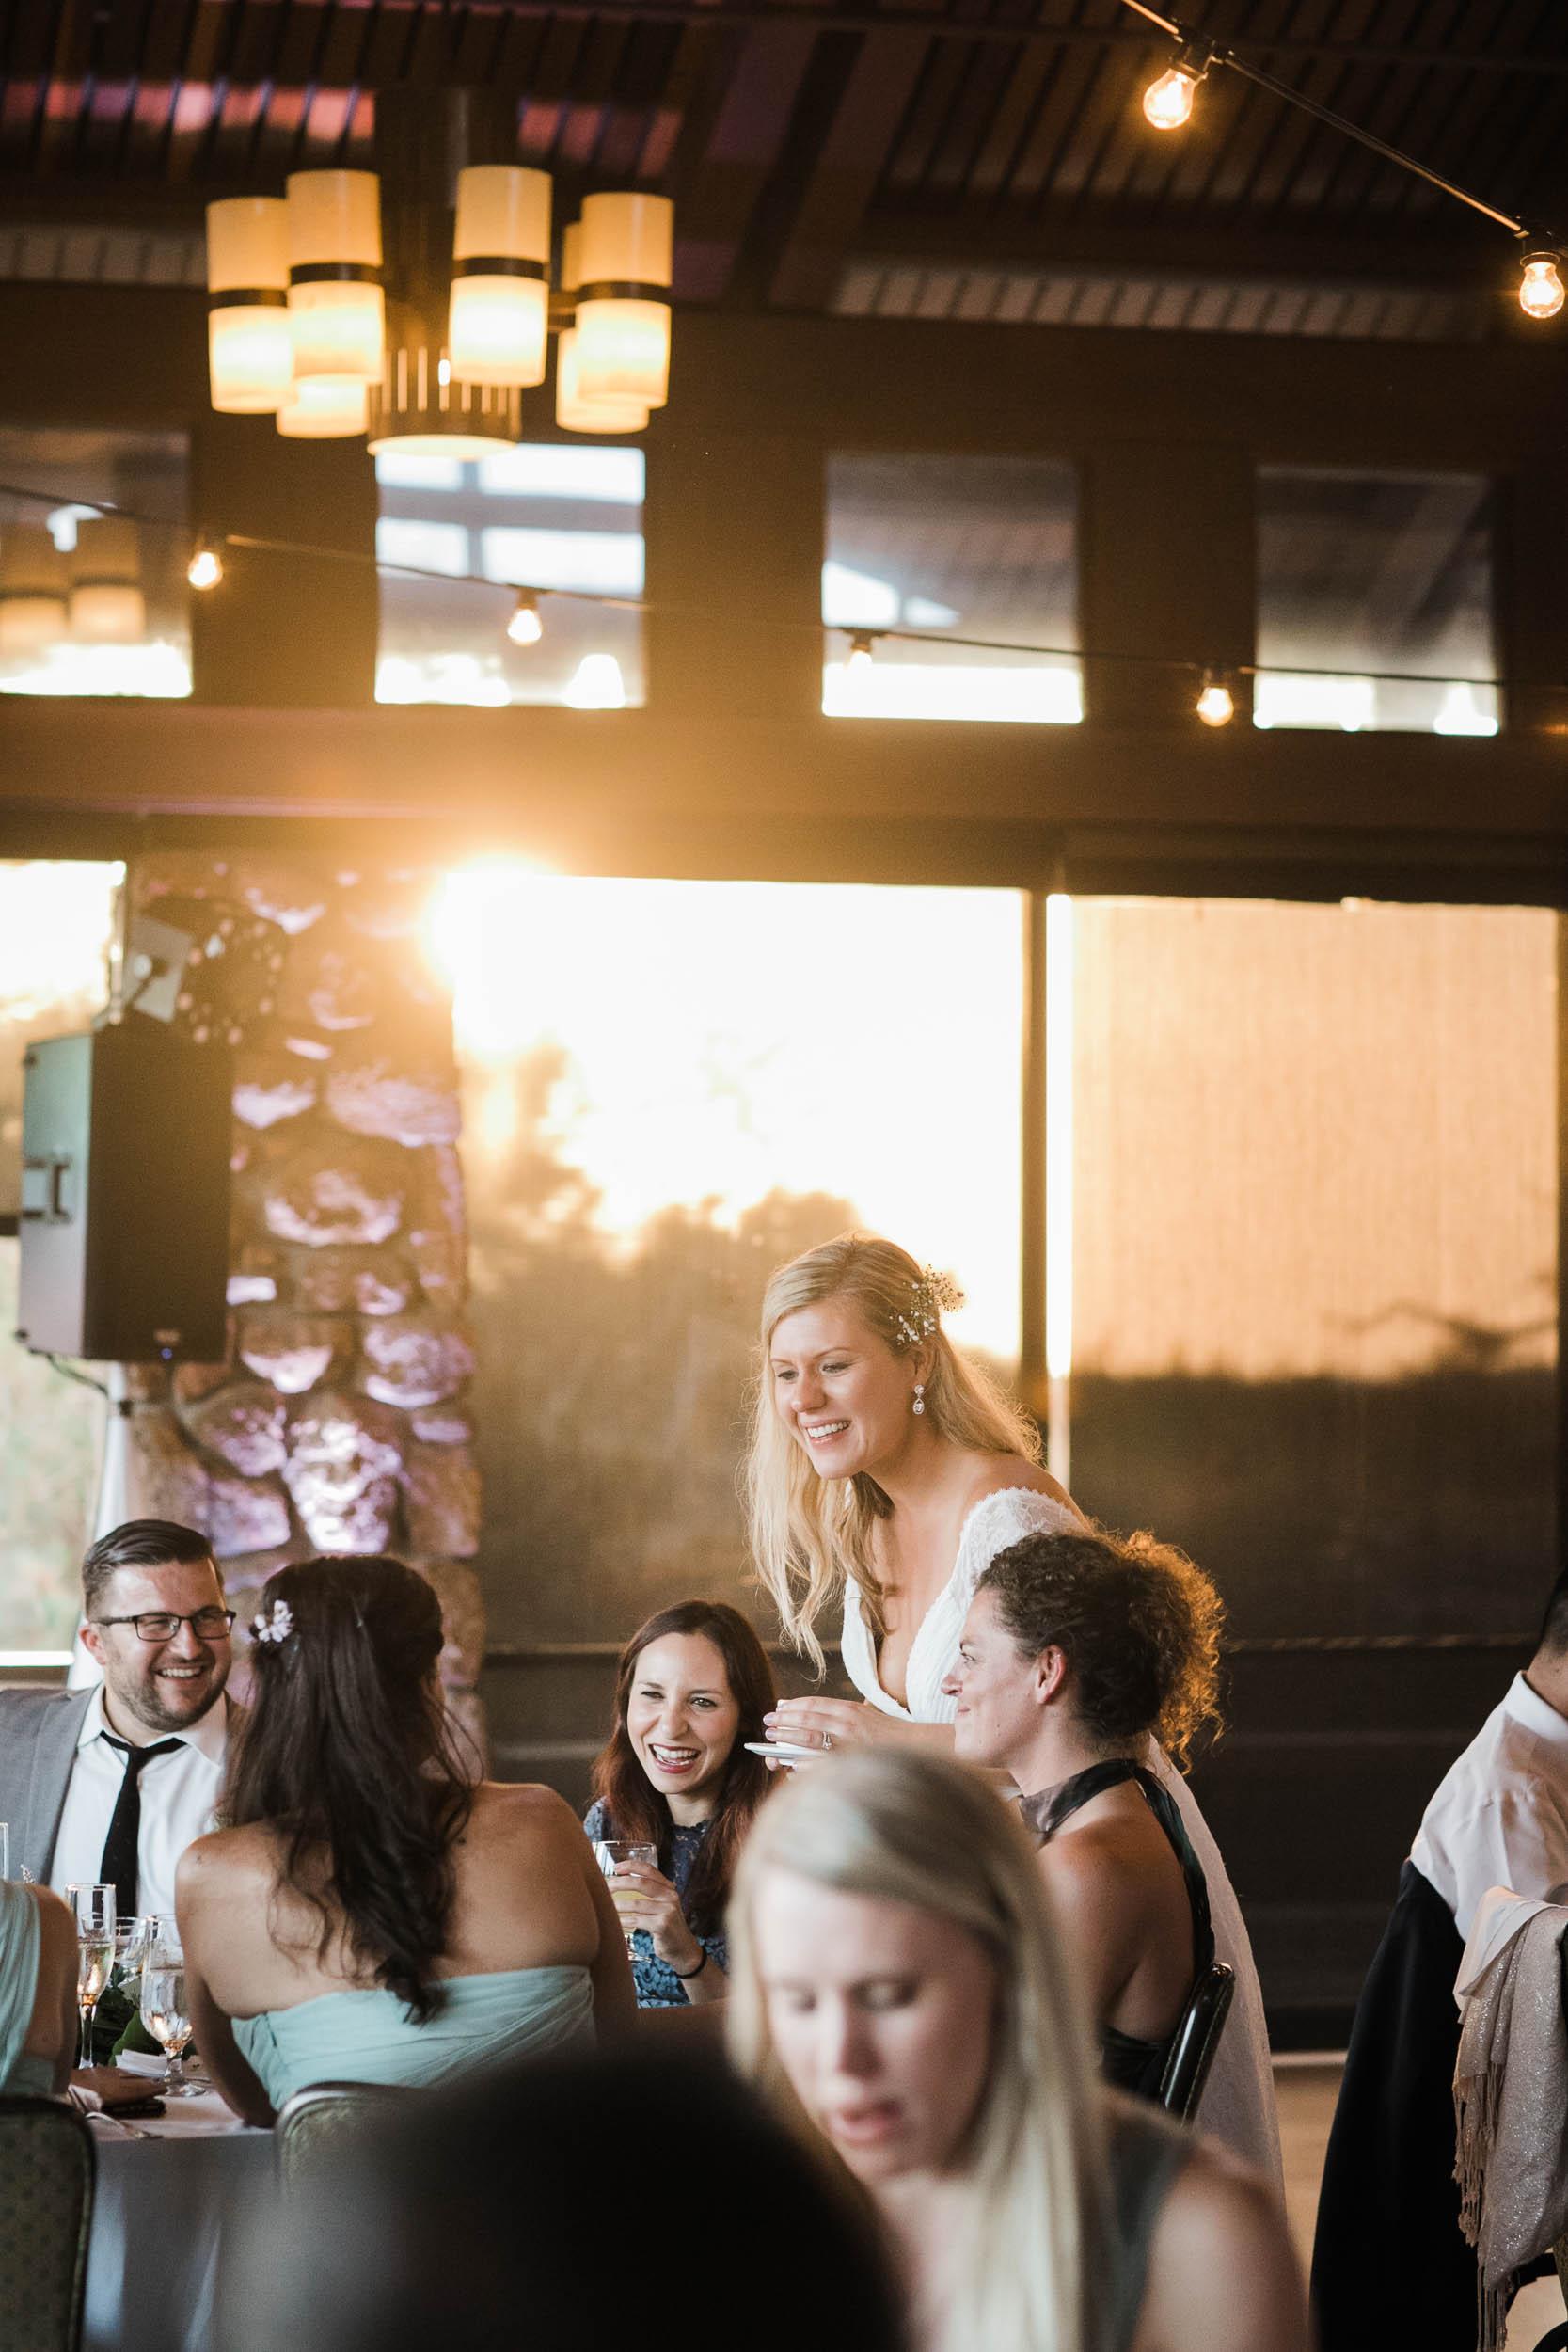 082617_C+K_Asilomar Pacific Grove Wedding_Buena Lane Photography_3045ER.jpg